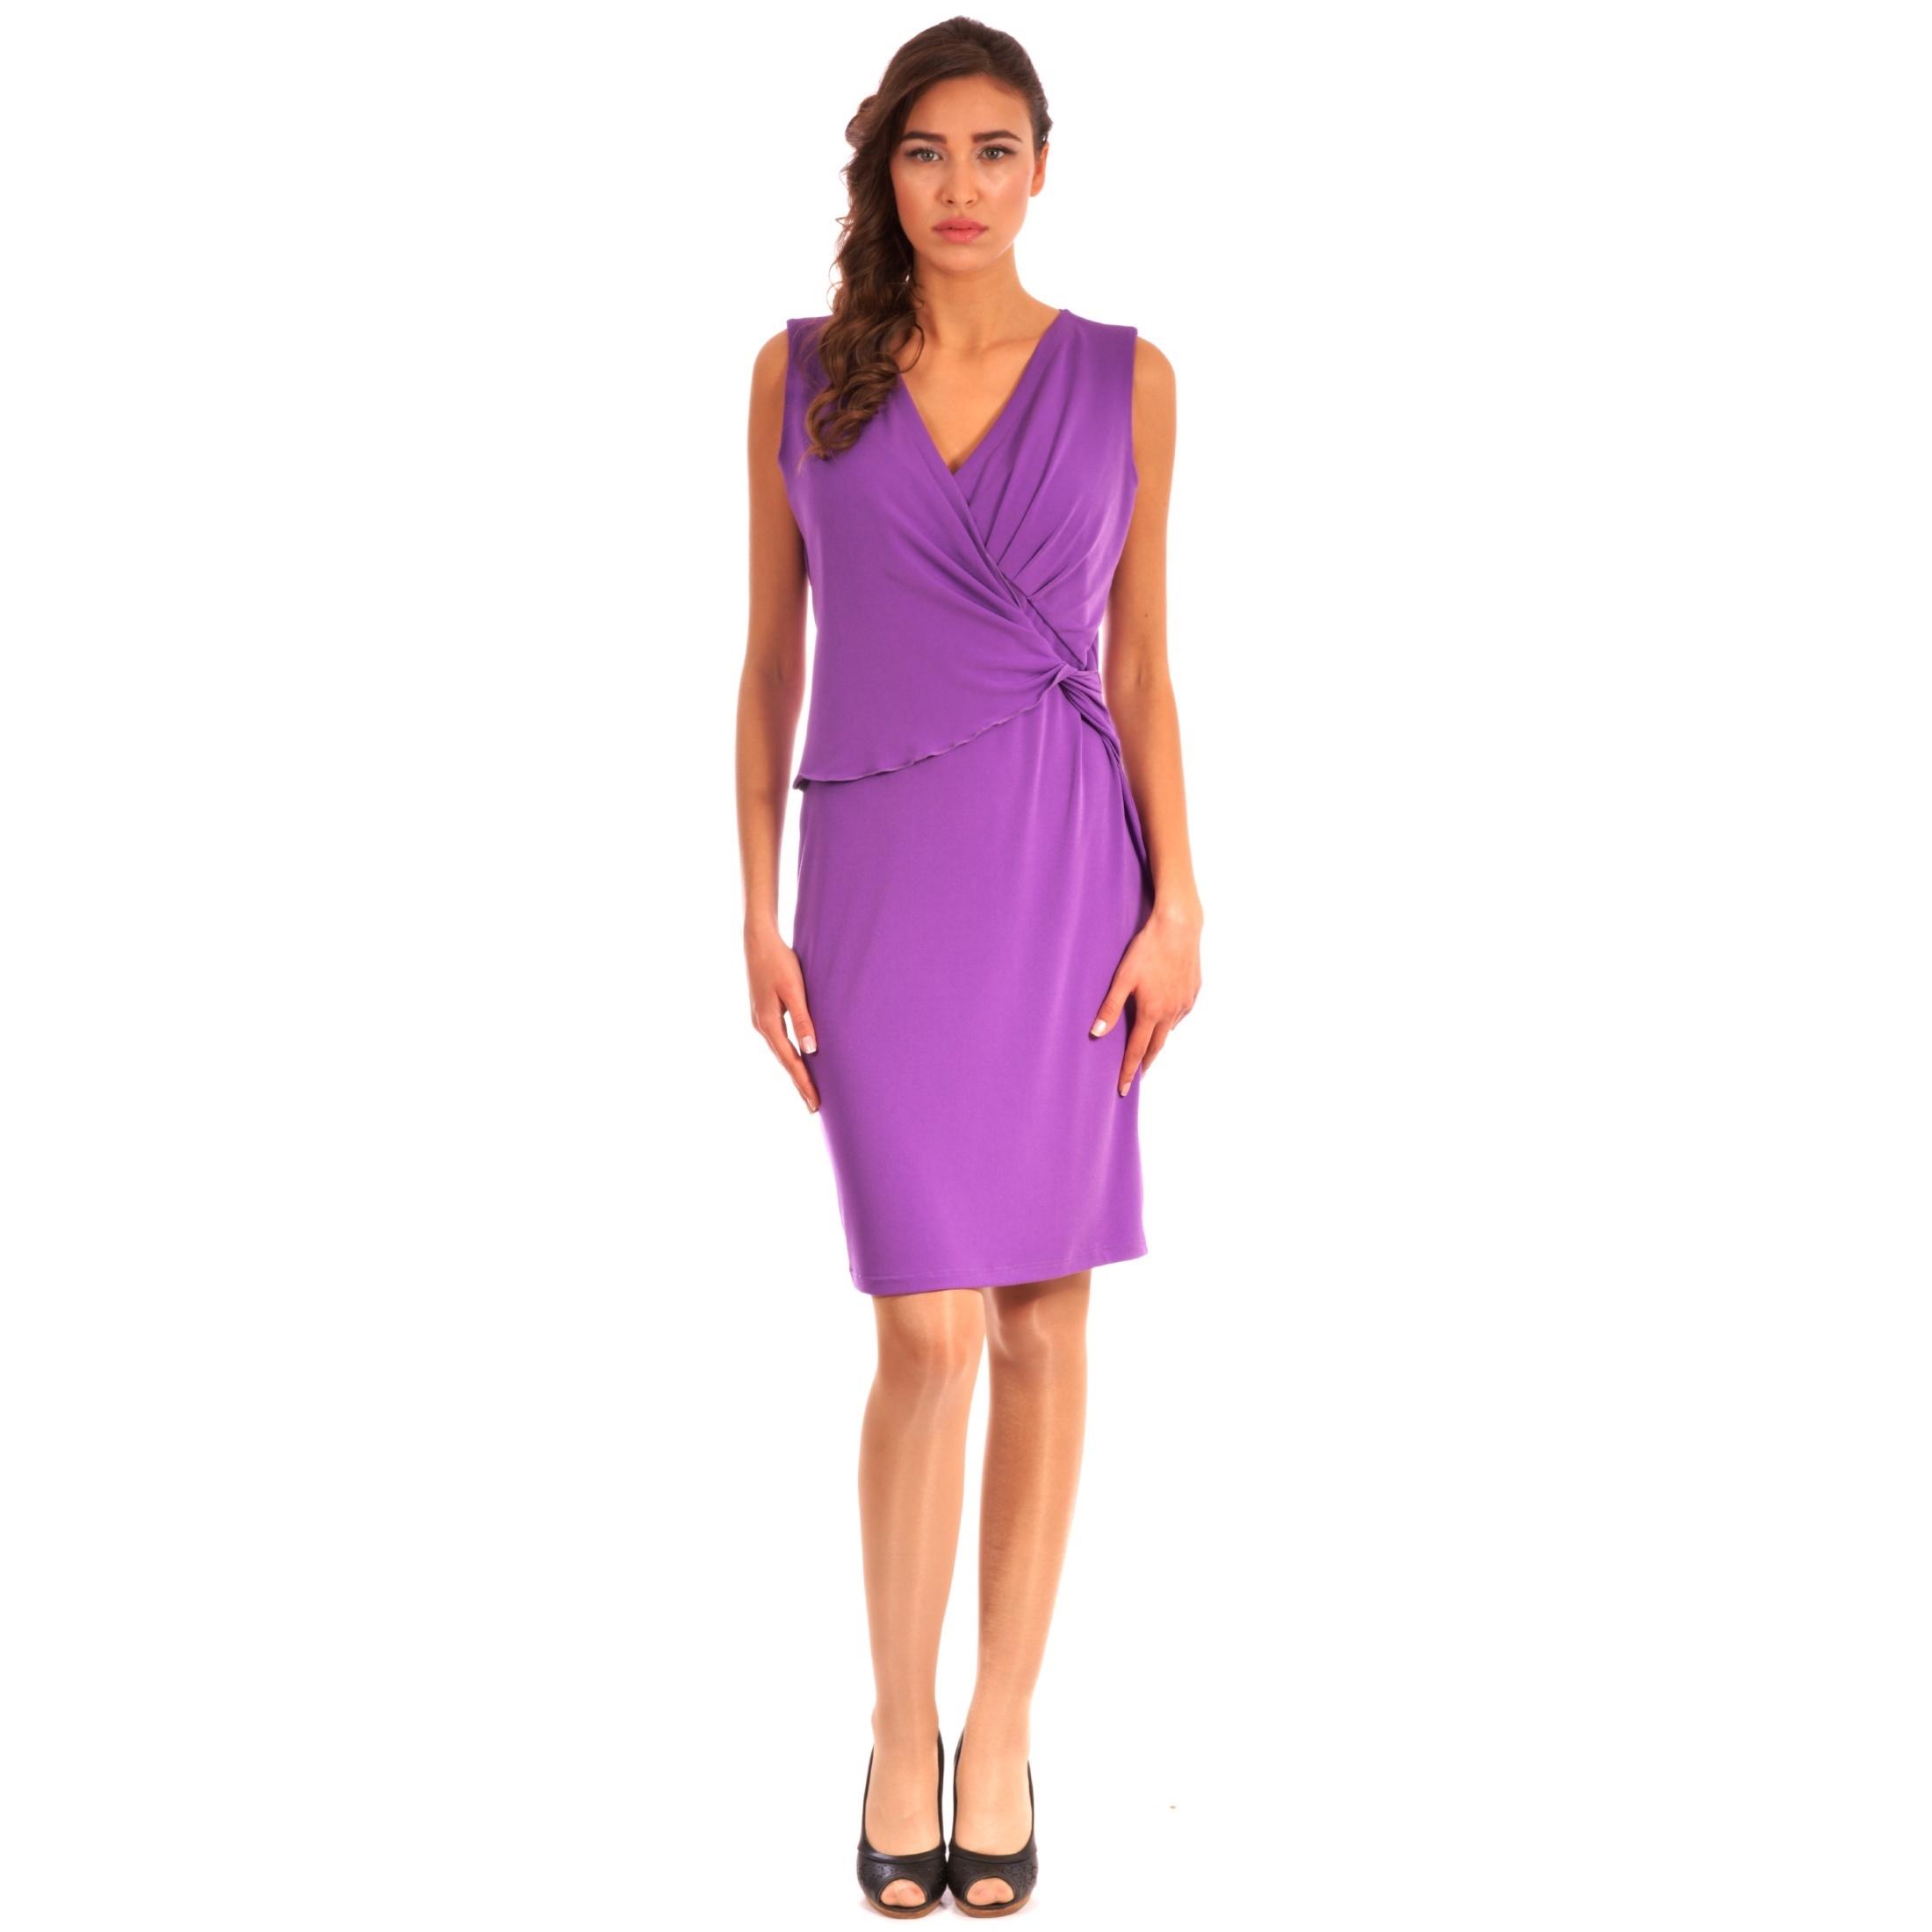 light violet women's dress lady m,ženska haljina lady m svijetlo ljubičasta